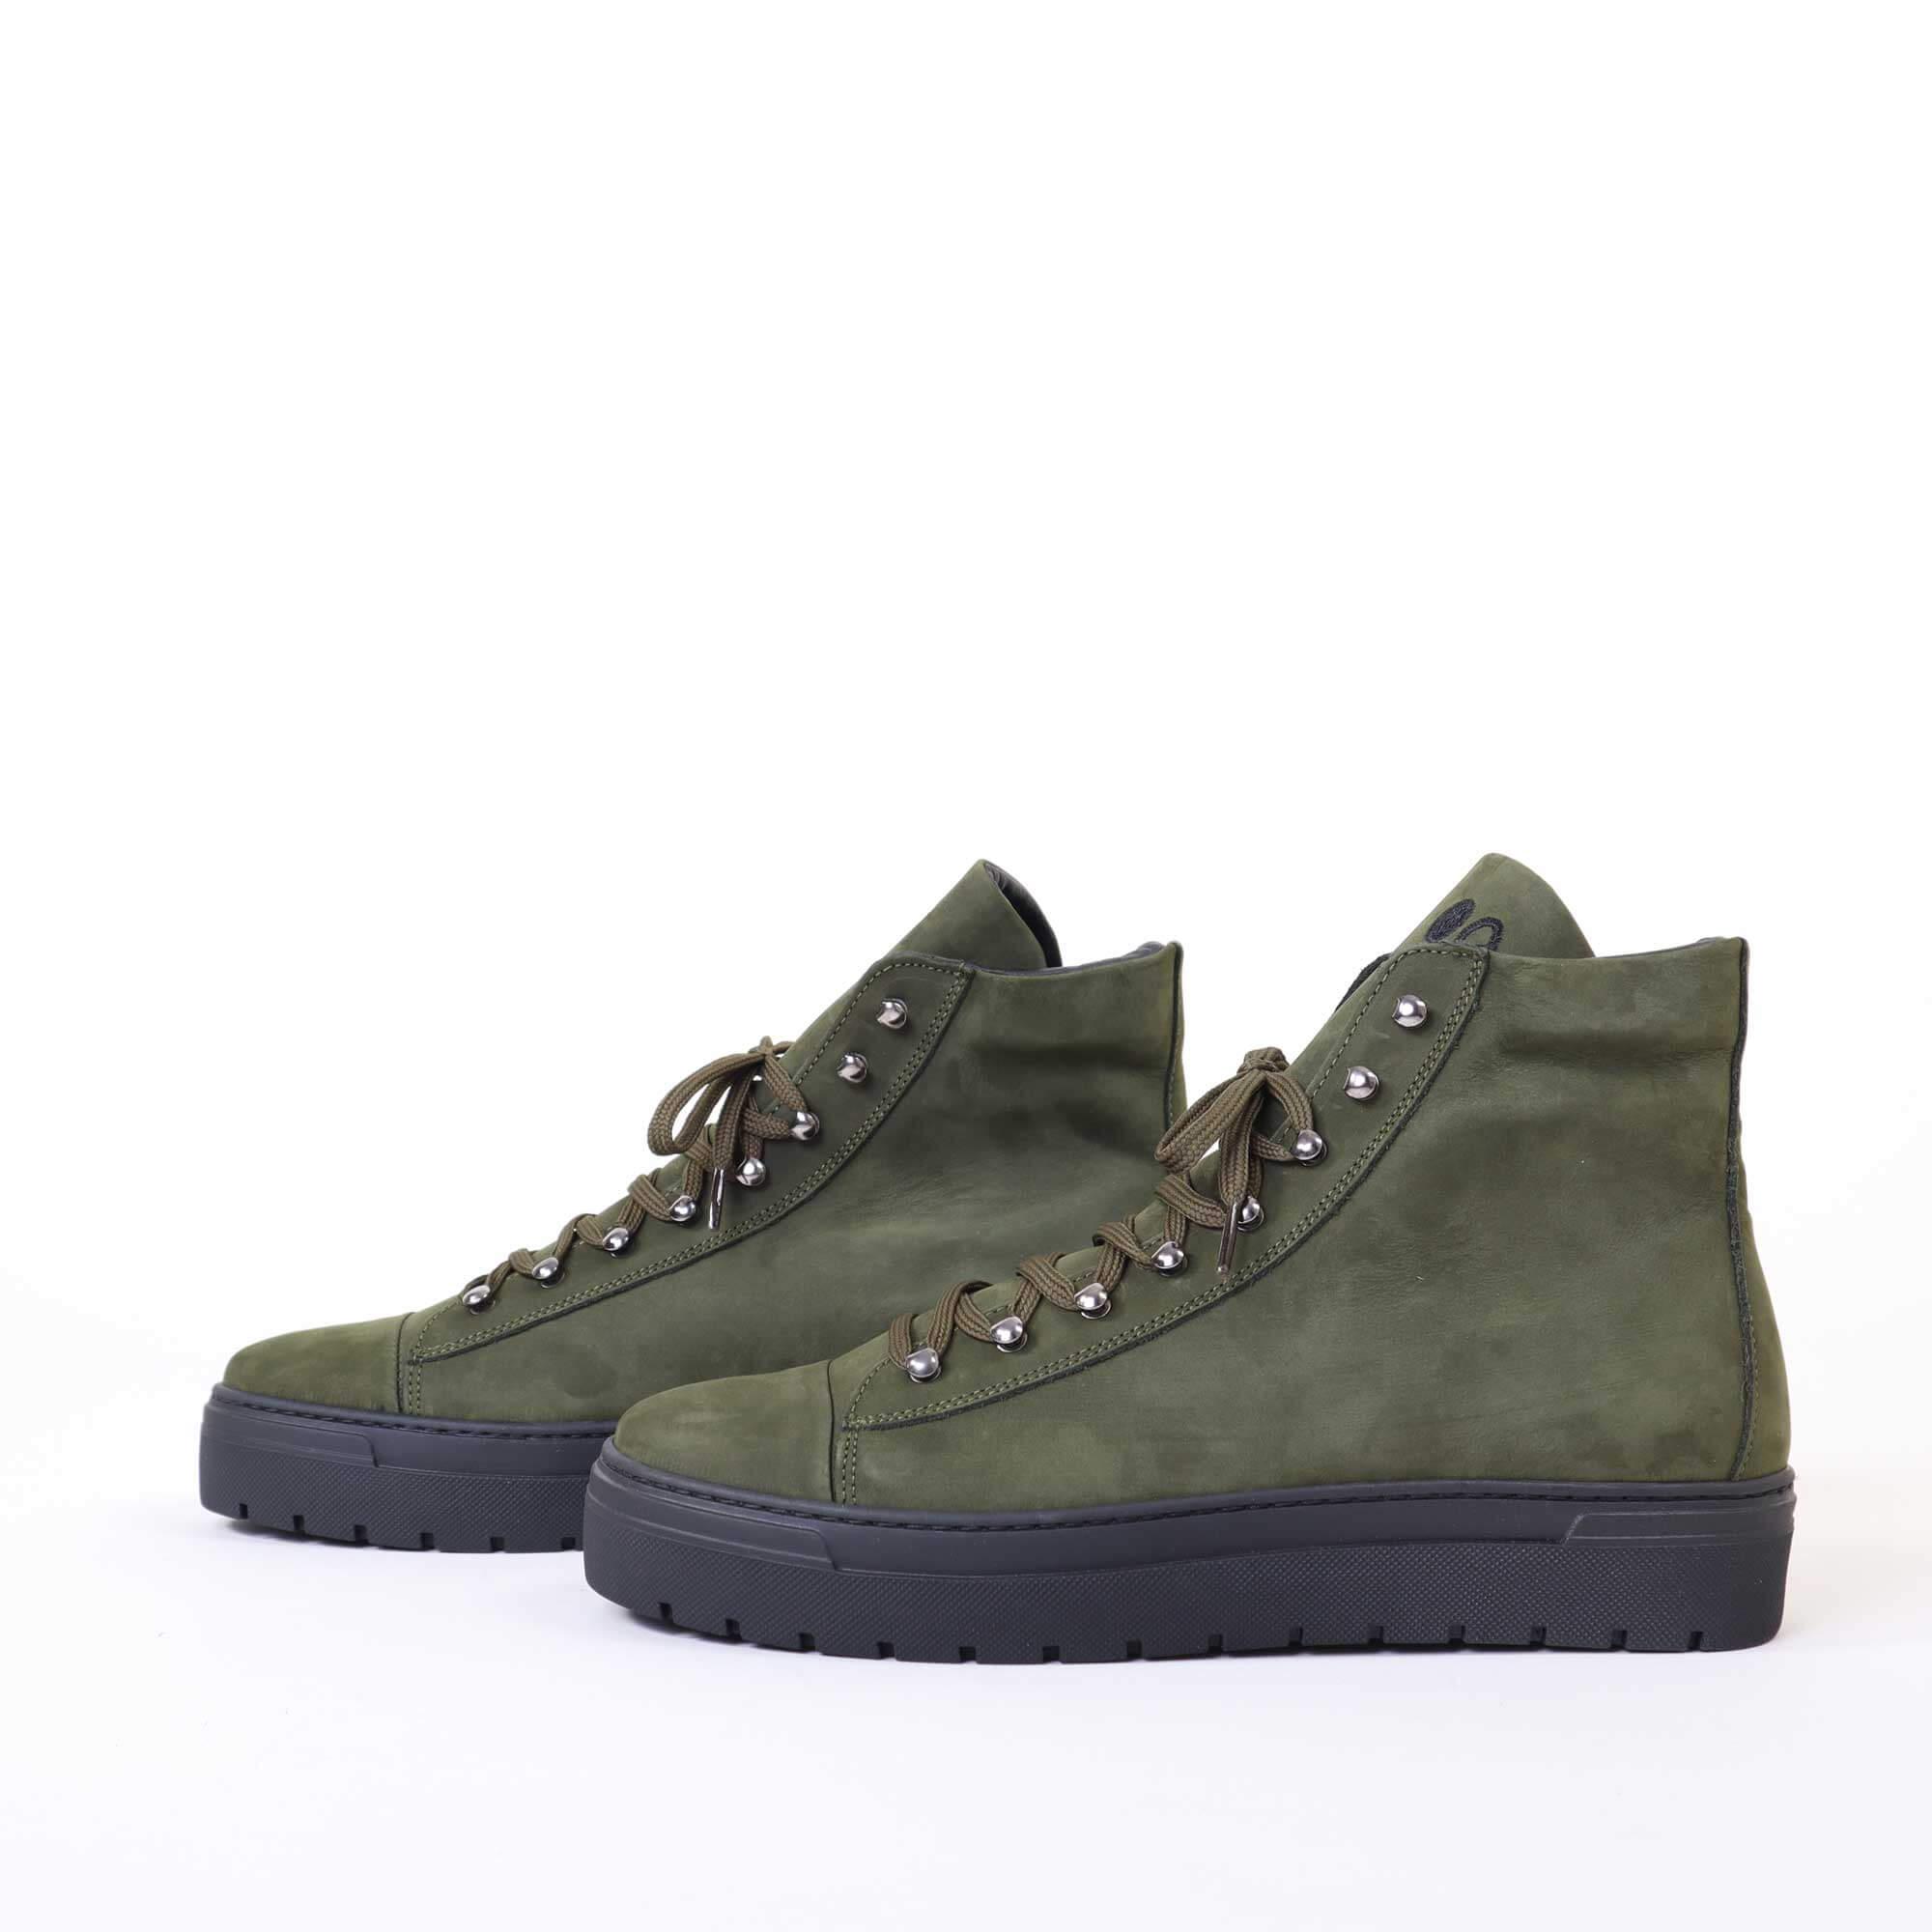 sneakers-h-green-3